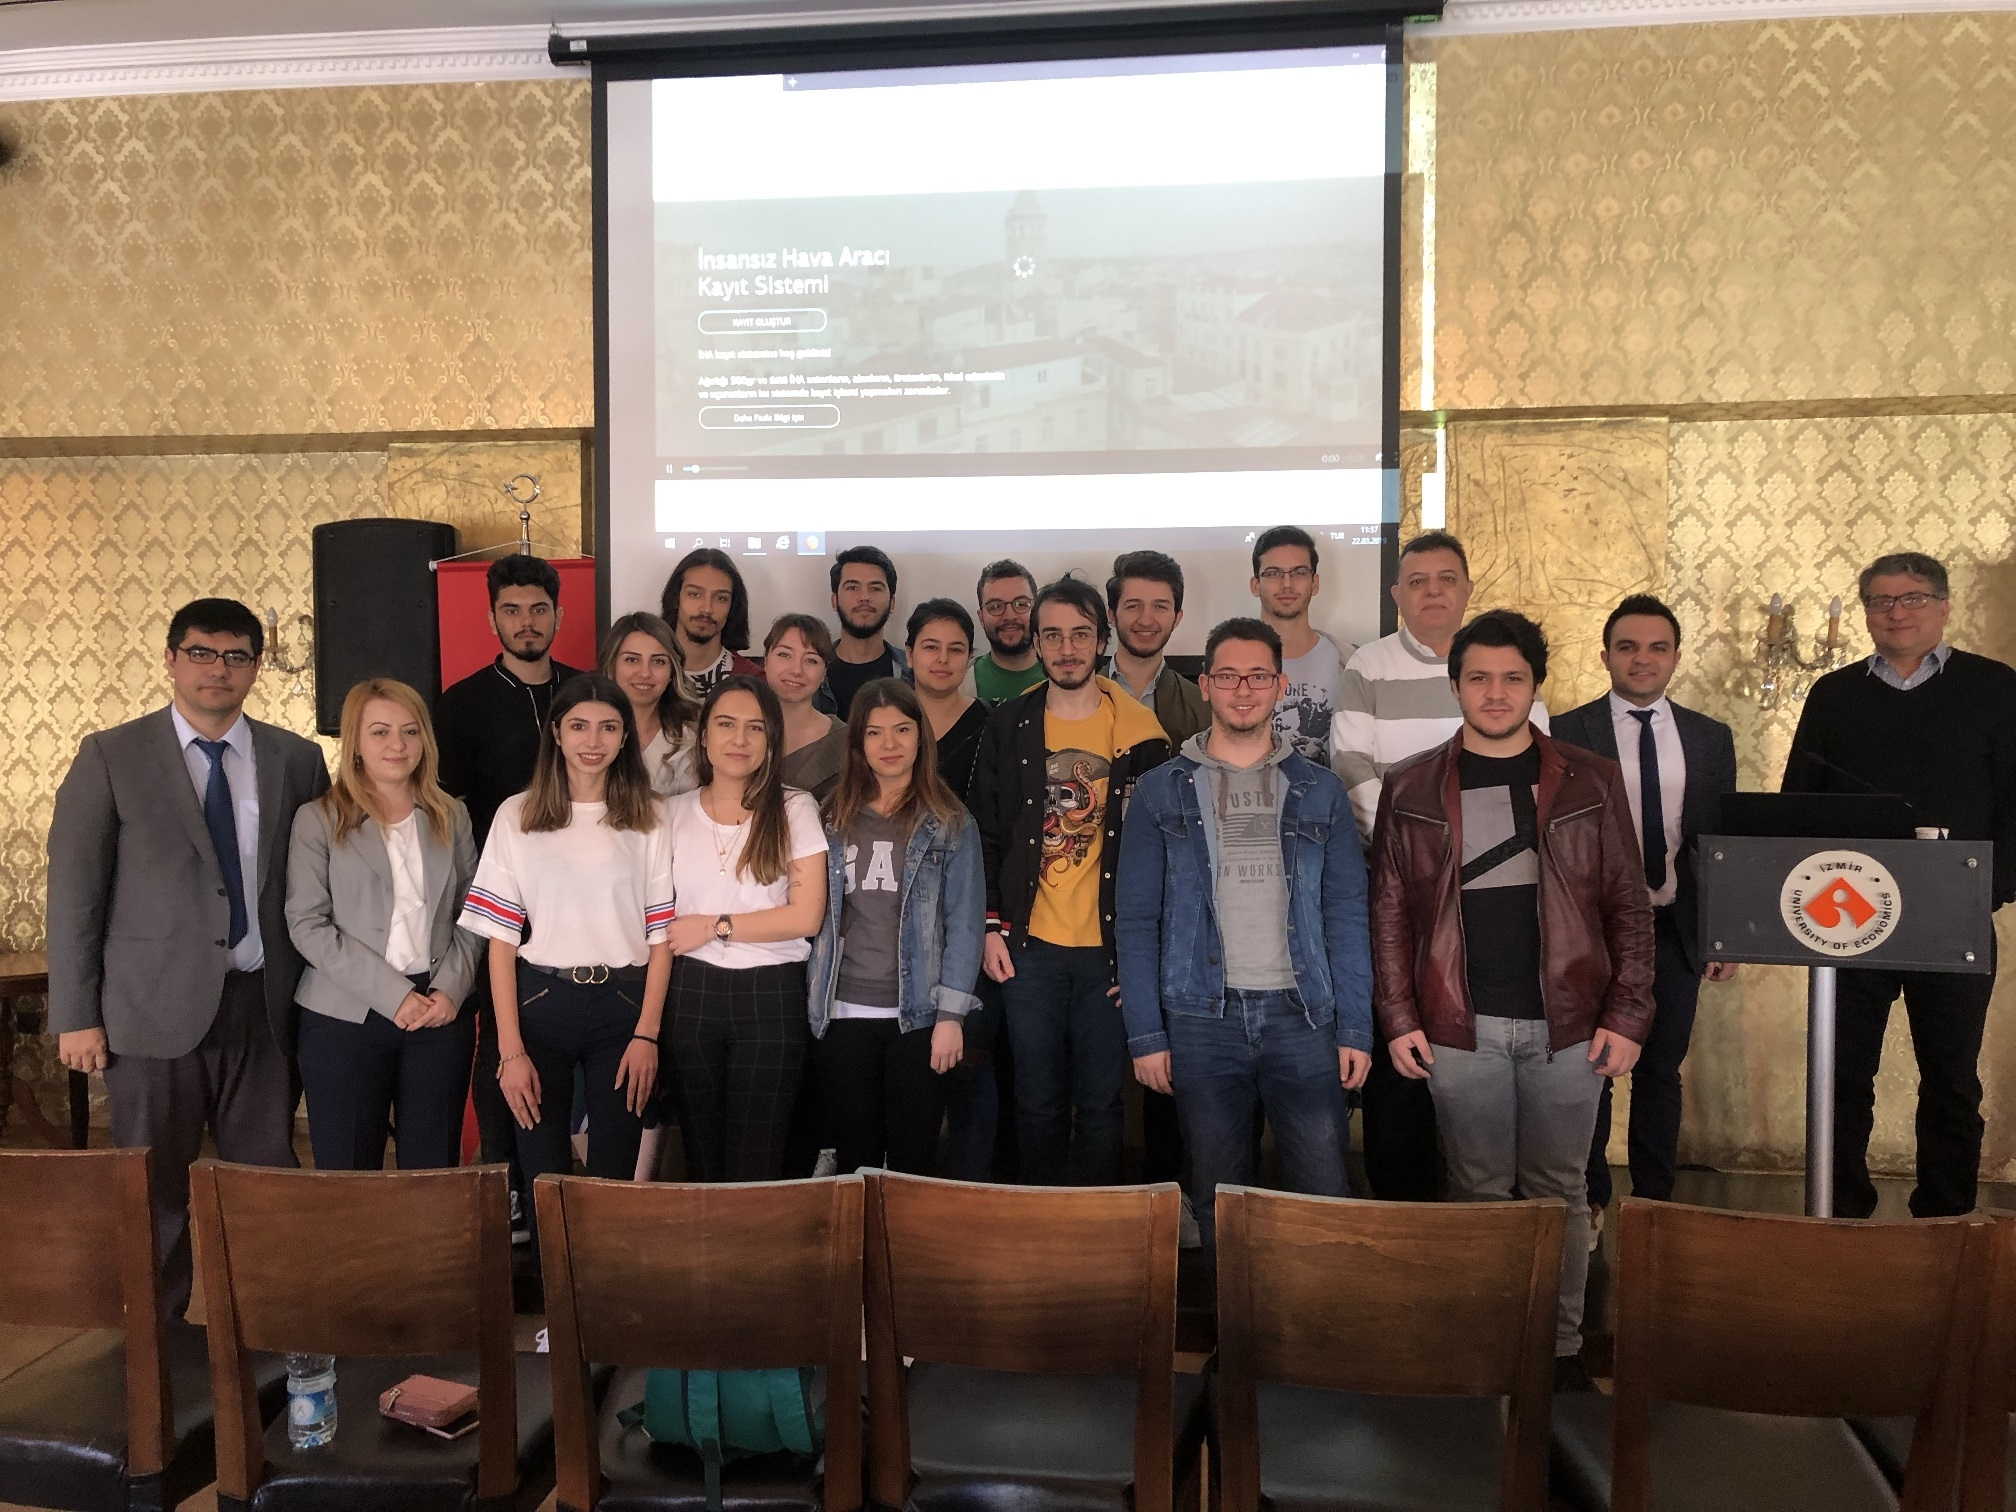 UAV Seminar held at IUE